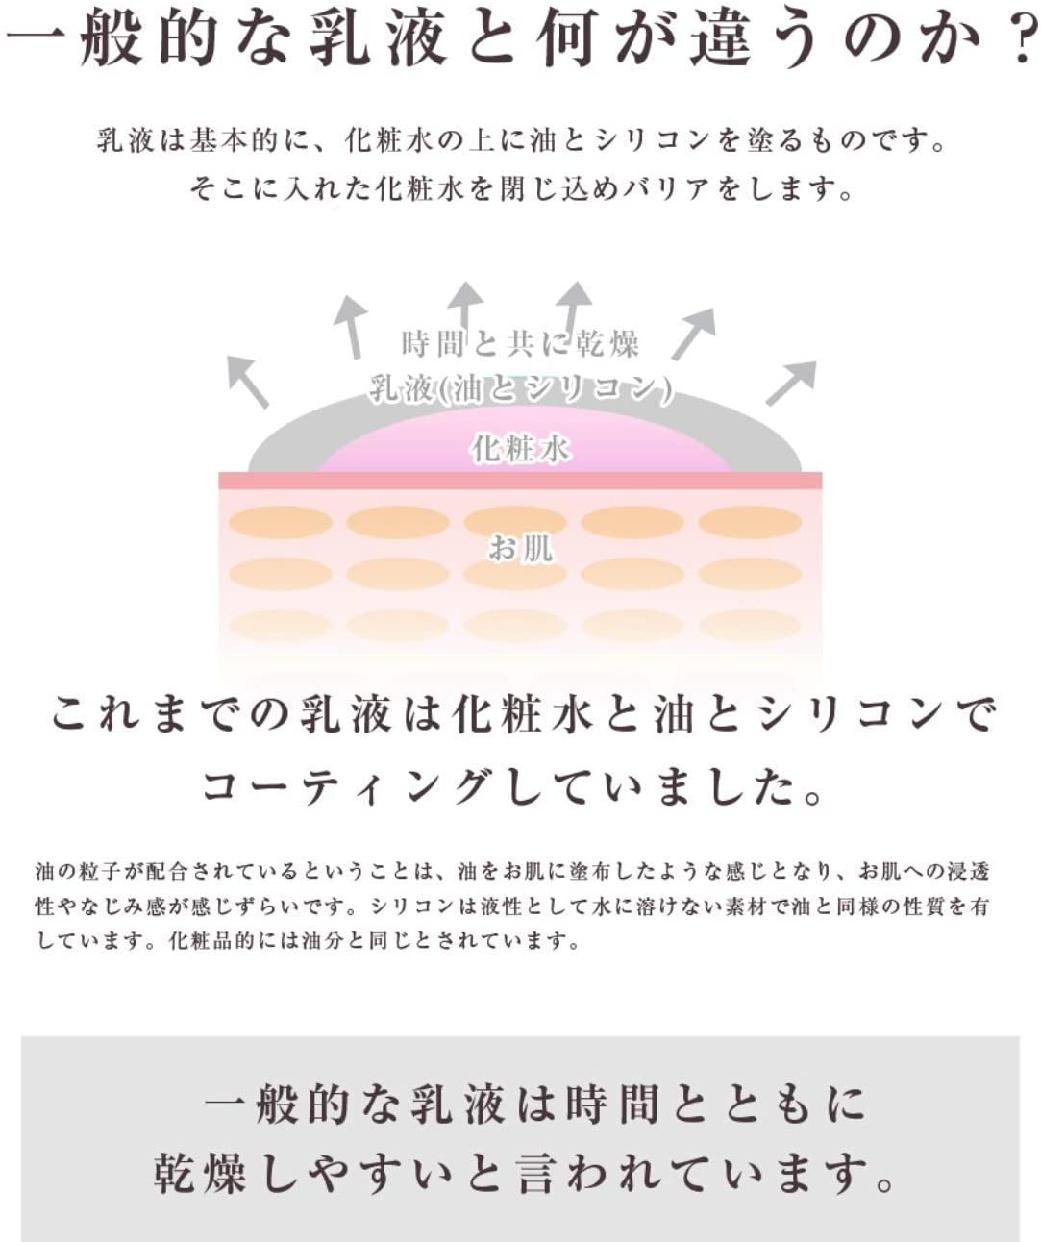 SURISURI(スリスリ) エマルジョン (乳液)の商品画像10